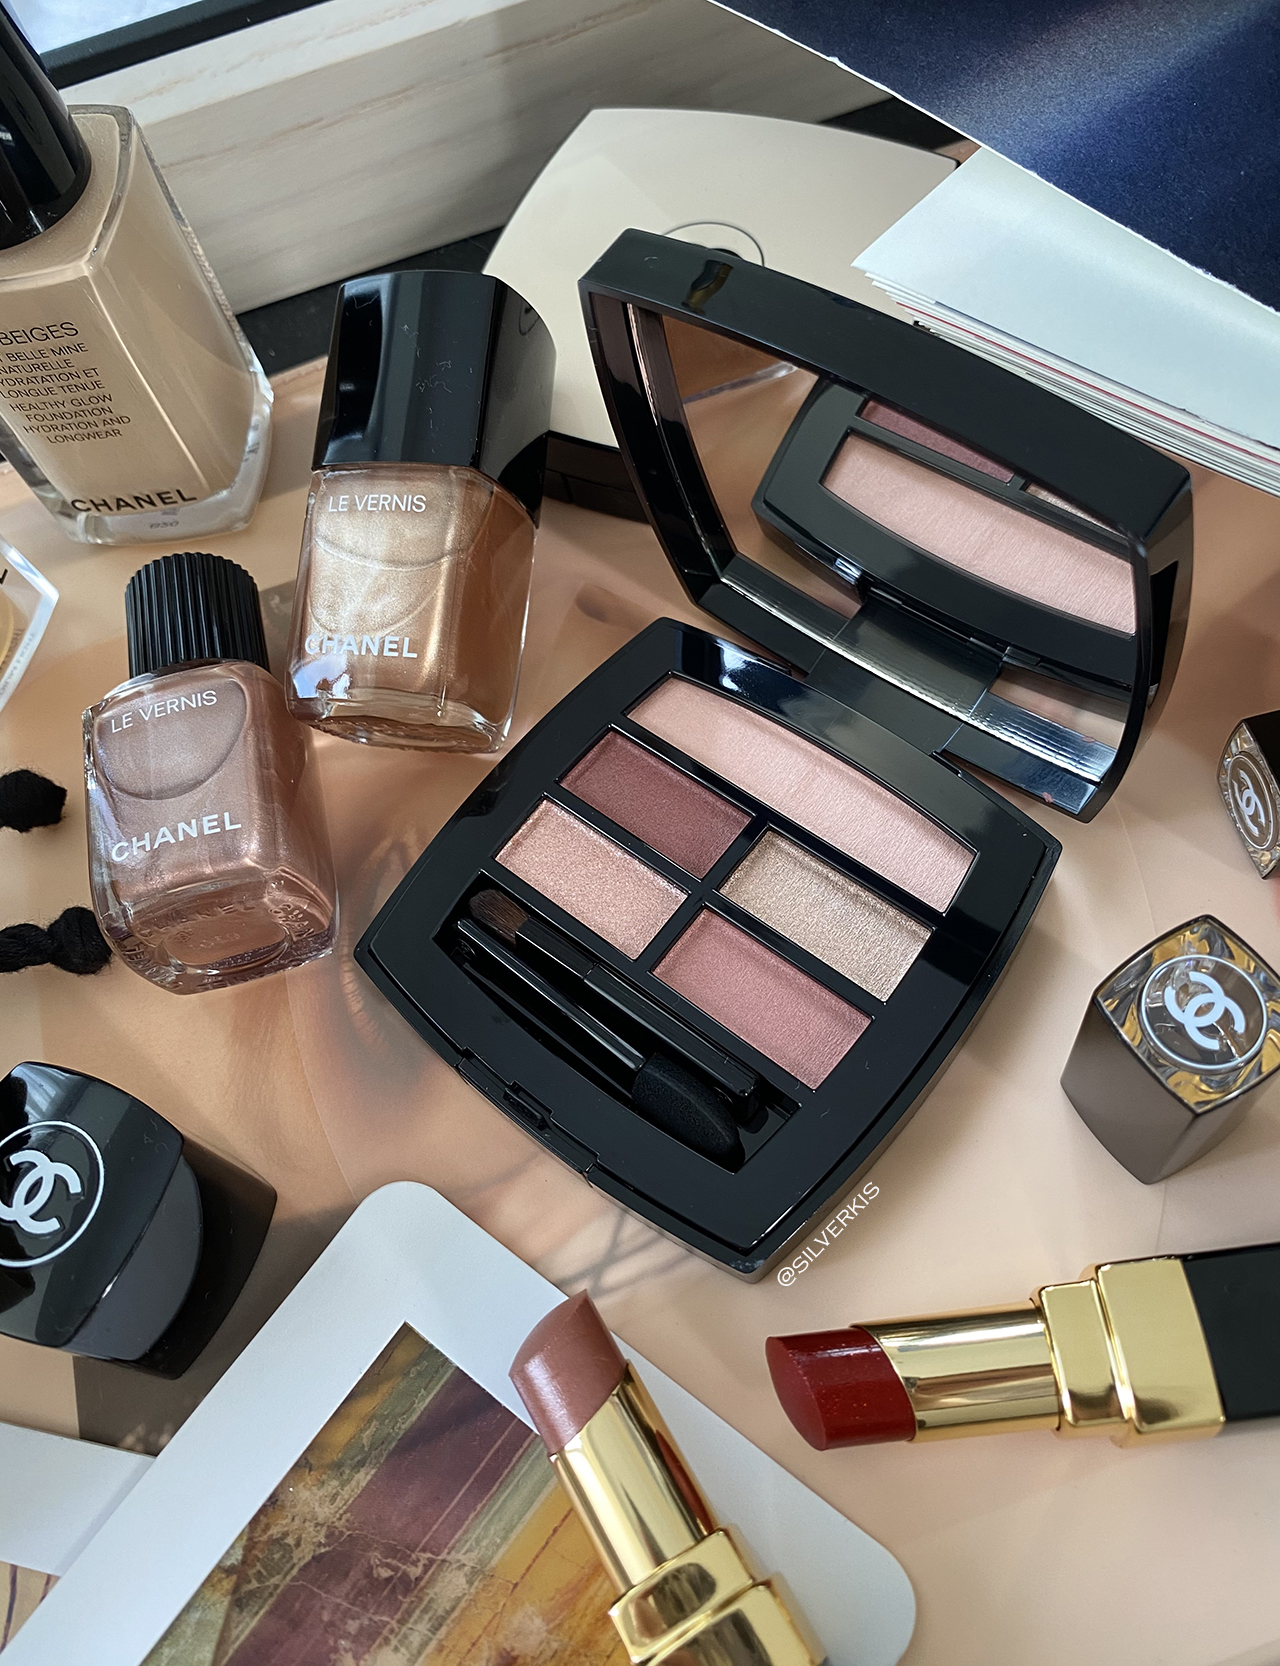 Chanel Les Beiges Healthy Glow Natural Eyeshadow Palette in Tender